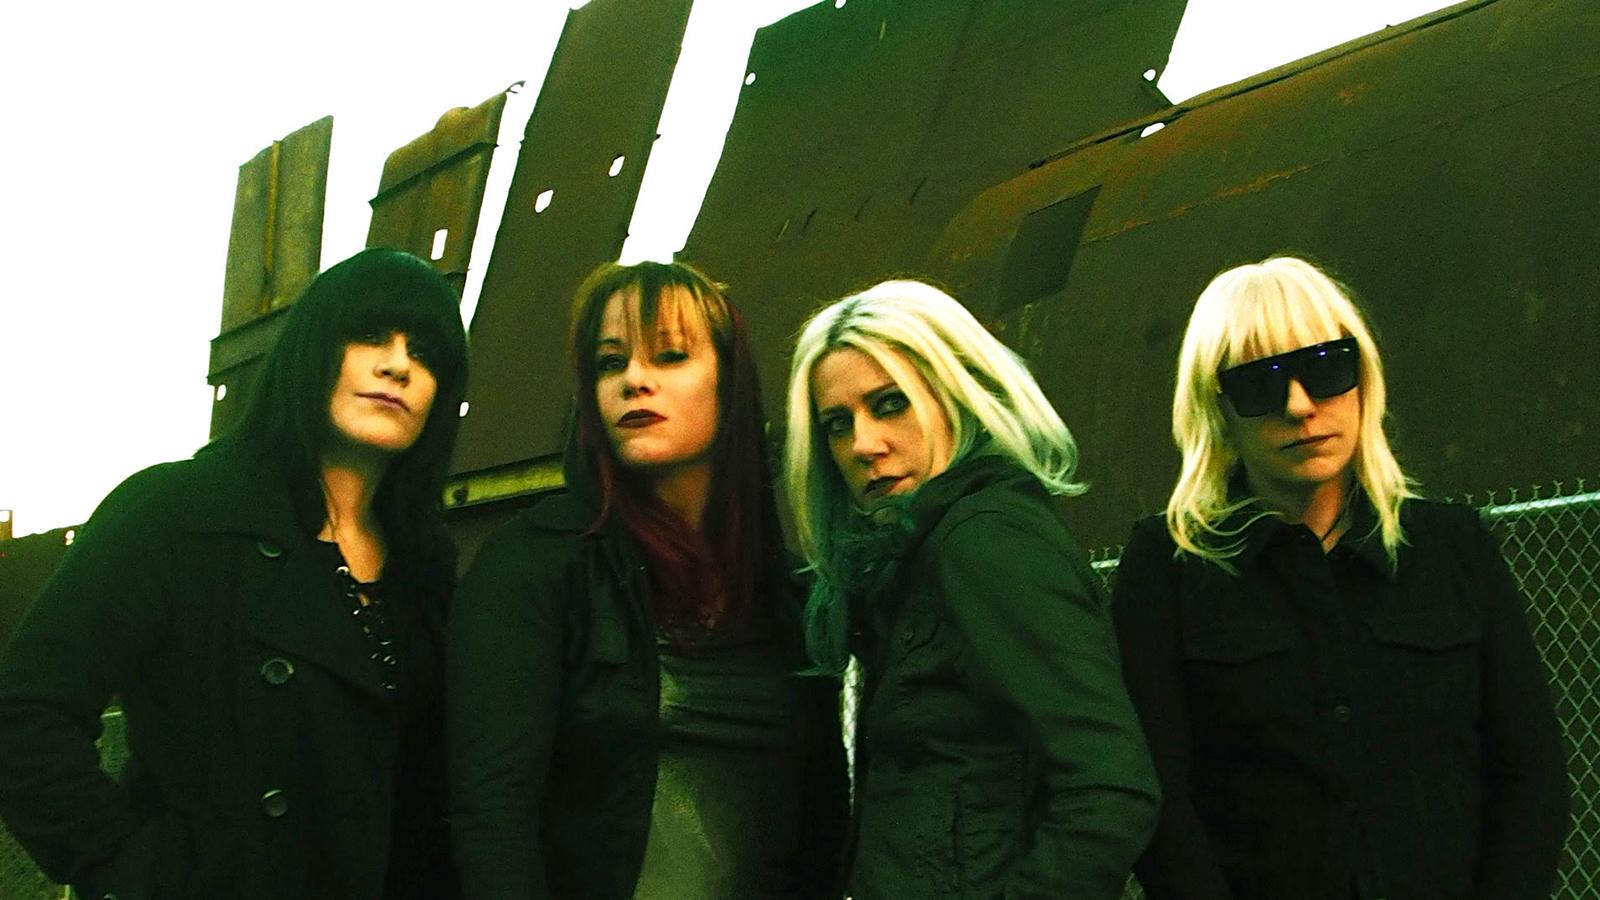 L7 on Broken Arms, Lesbian Fans, Twerking, Biting New Album 'Scatter the Rats'